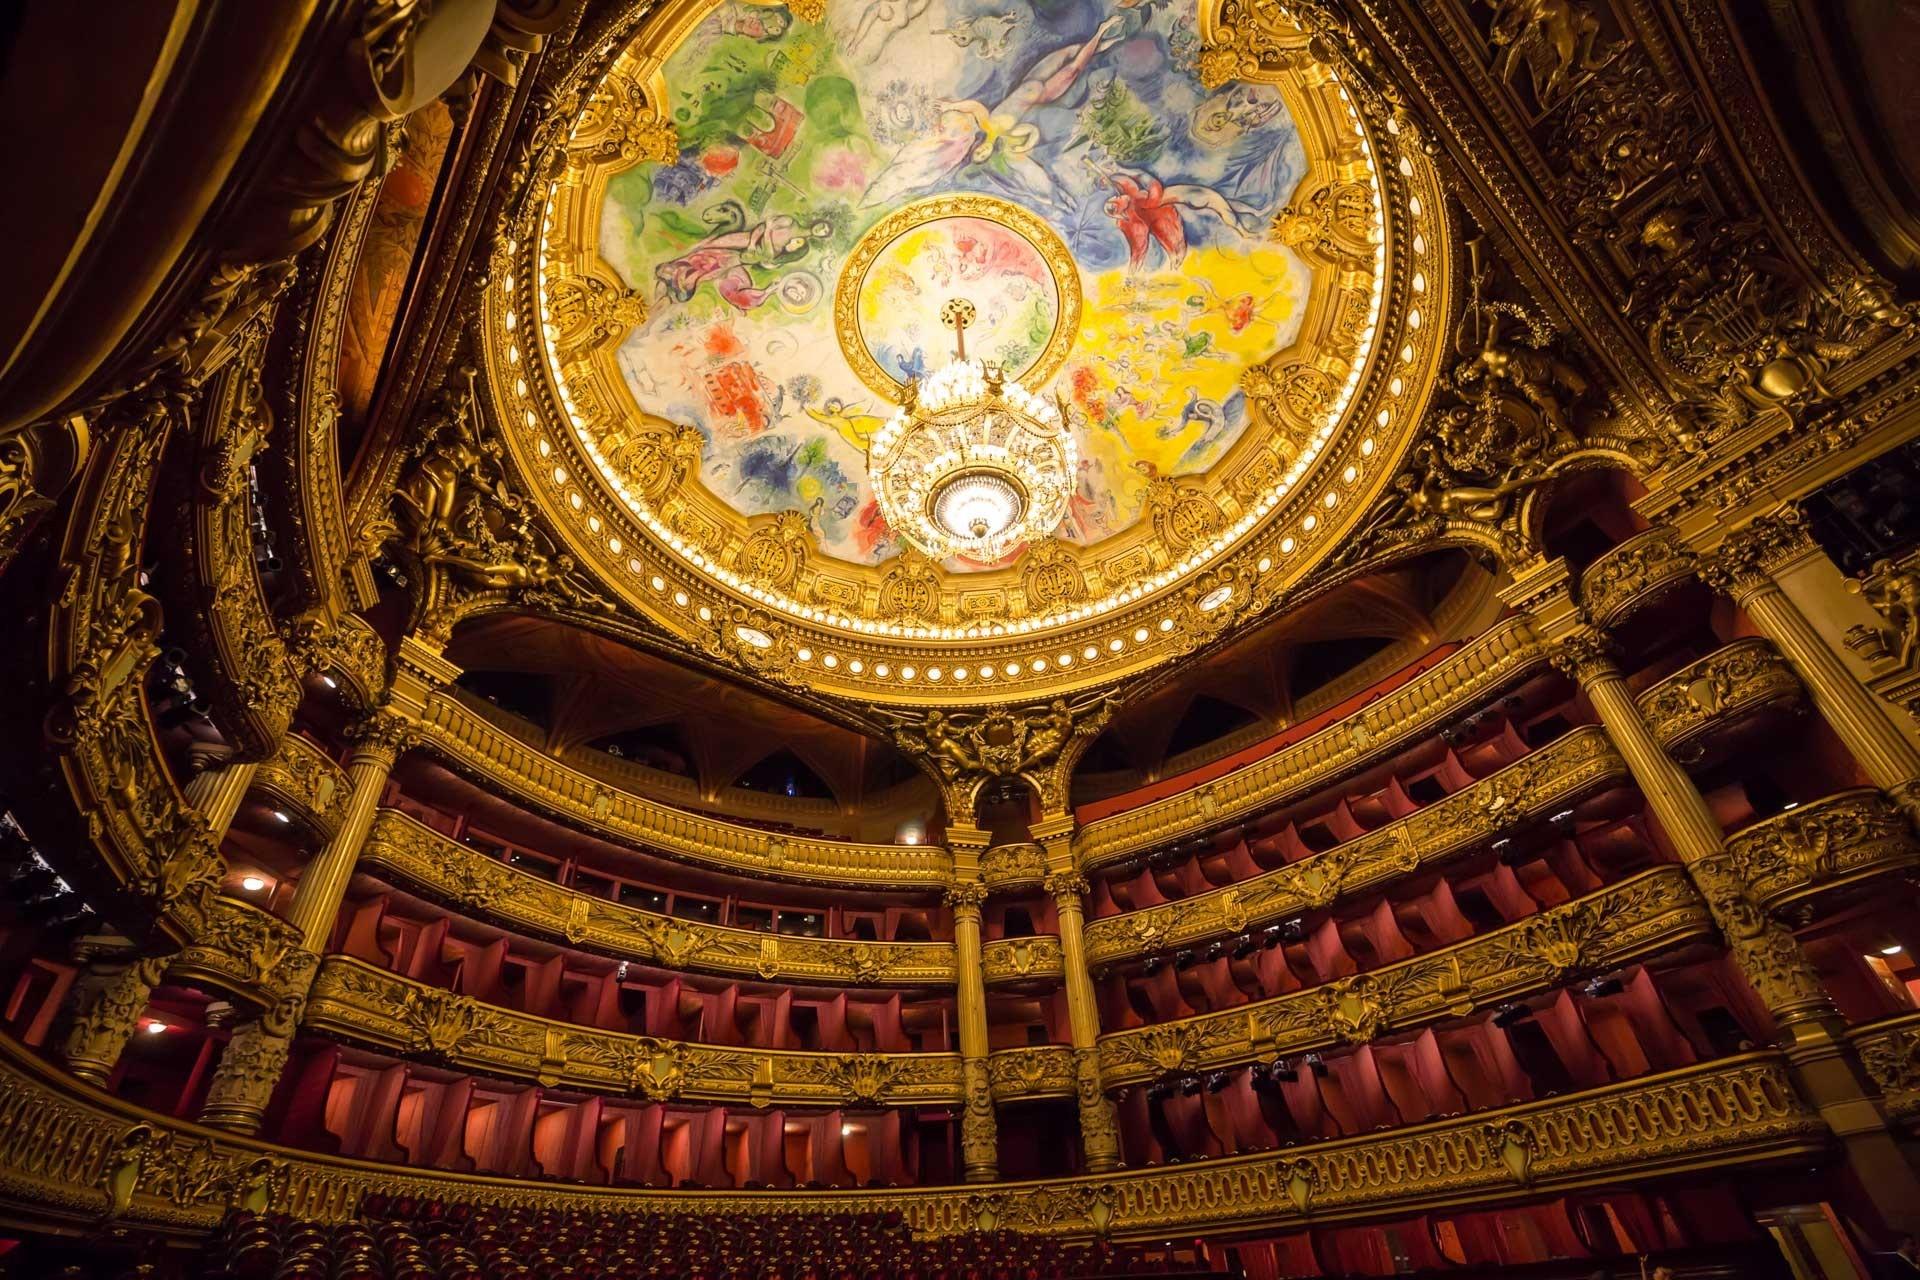 Opéra Nacional de Paris, Parigi, ONP1819, Jonas Kaufmann, Opéra Bastille, Opéra Garnier, Michele Mariotti, 2018/2019, Philippe Jordan, Damiano Michieletto, Anna Netrebko, Opéra de Paris